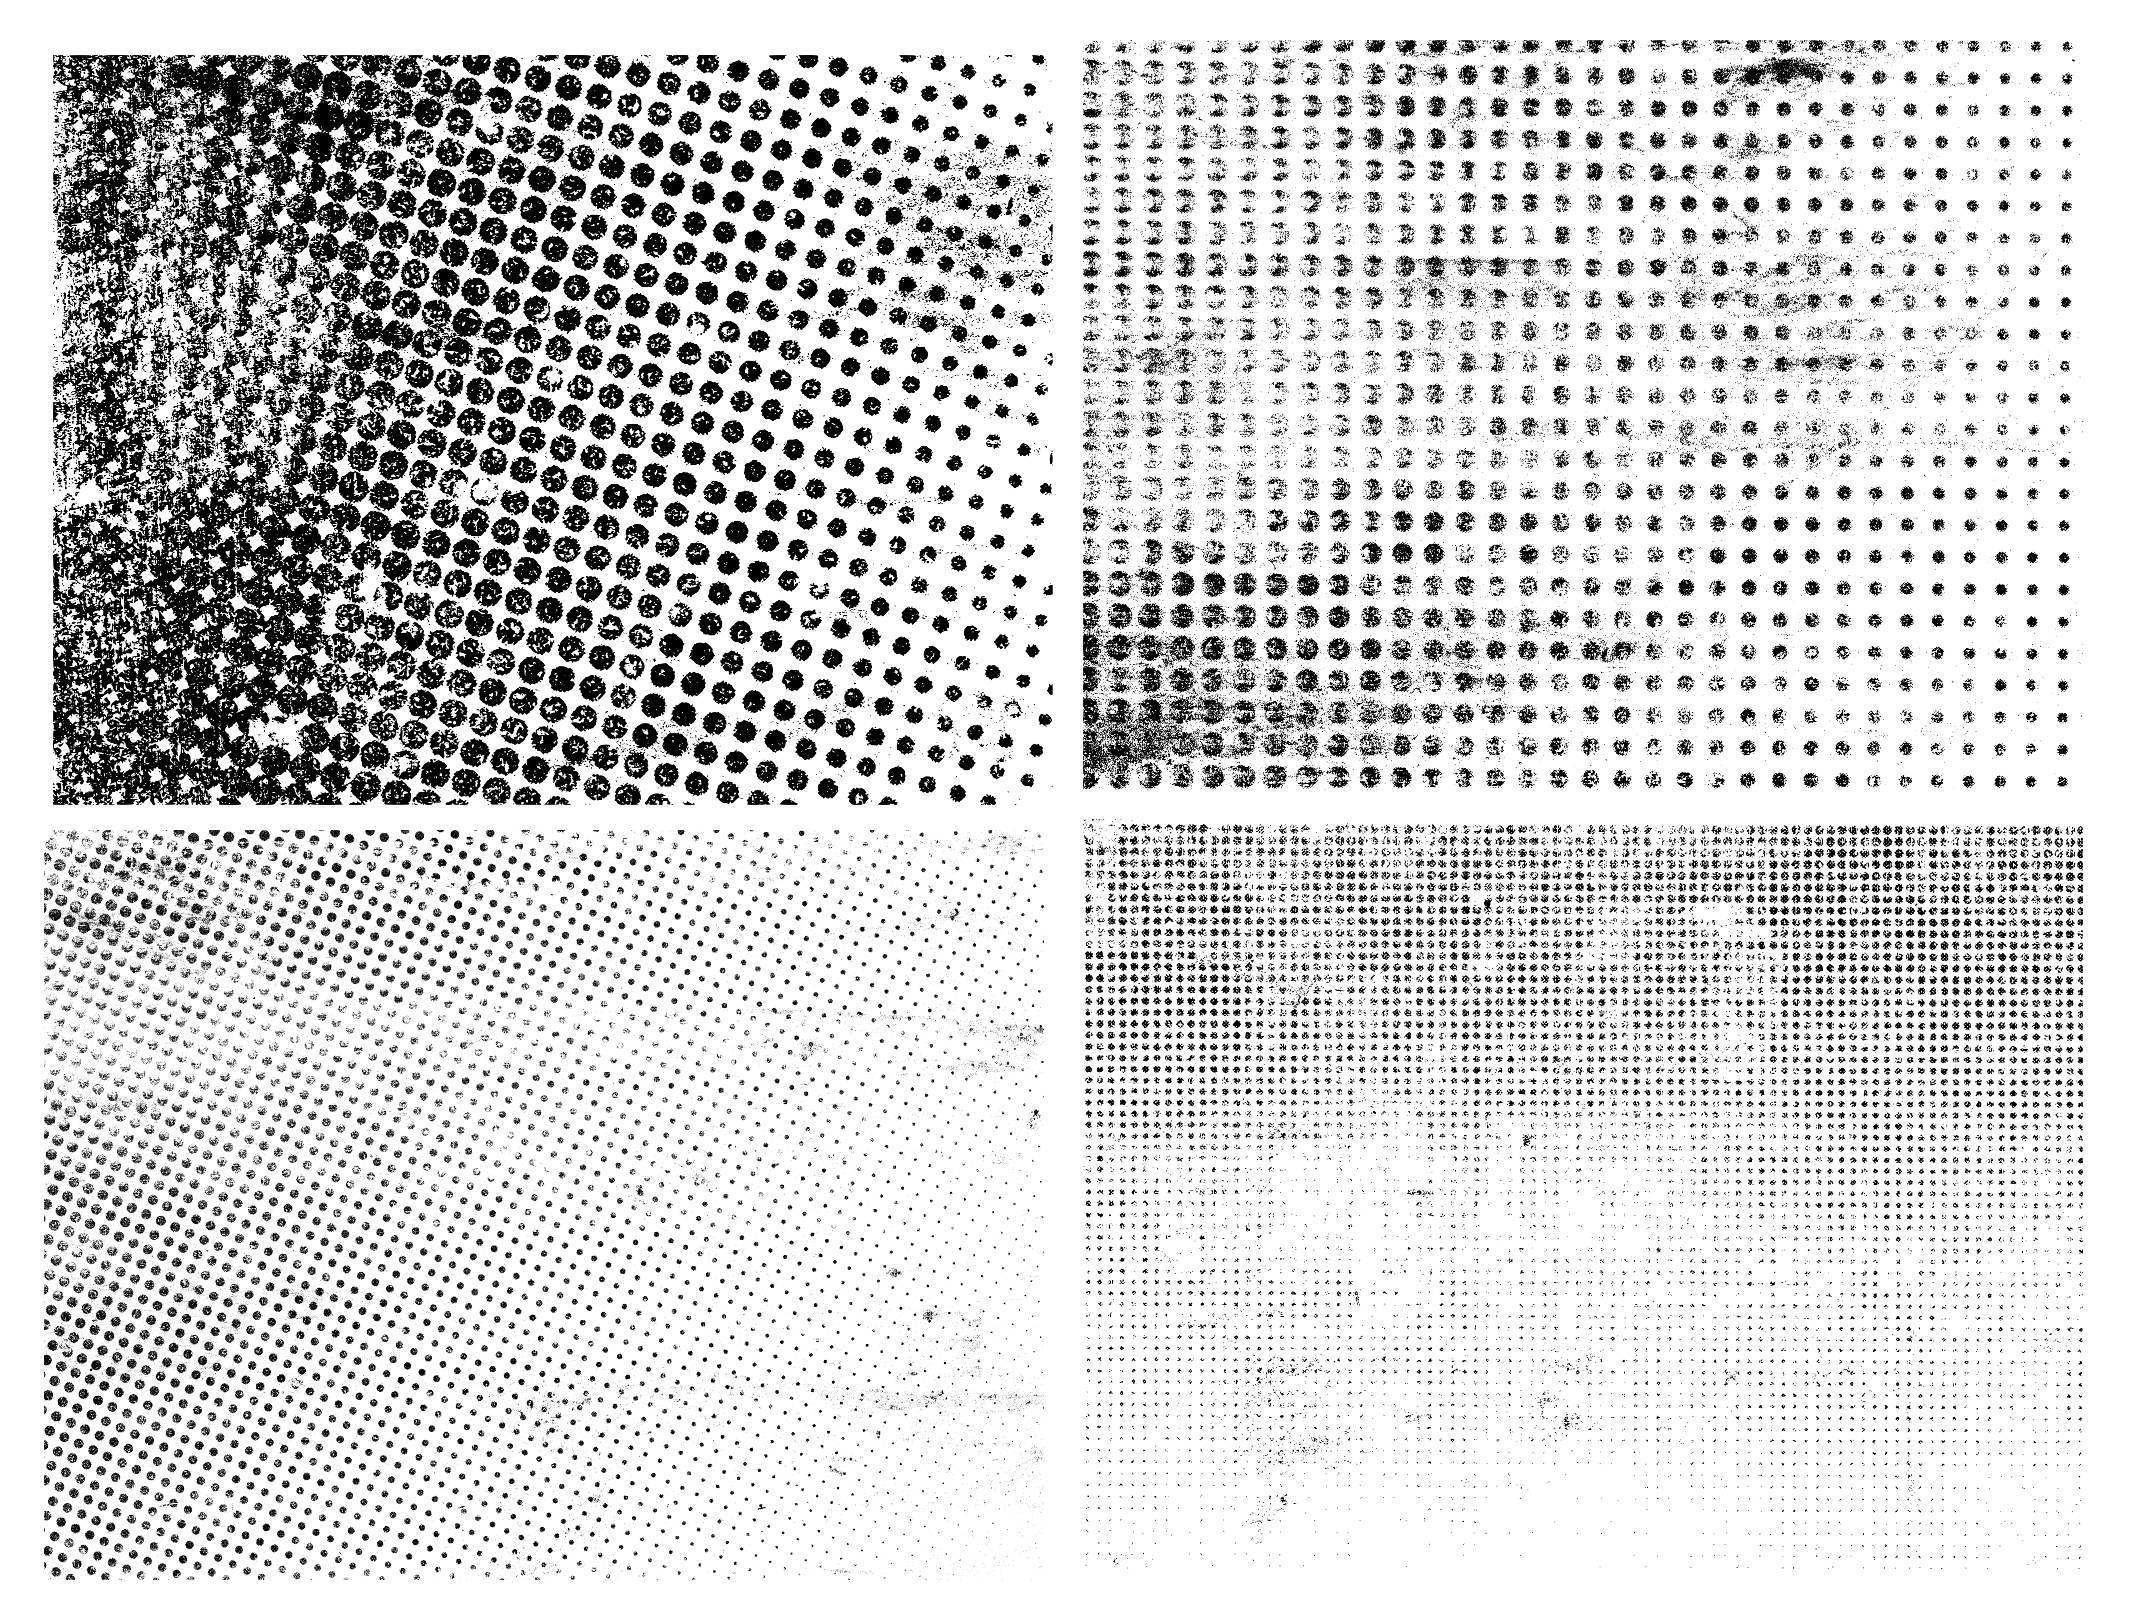 grunge-halftone-texture-overlay-cover.jpg